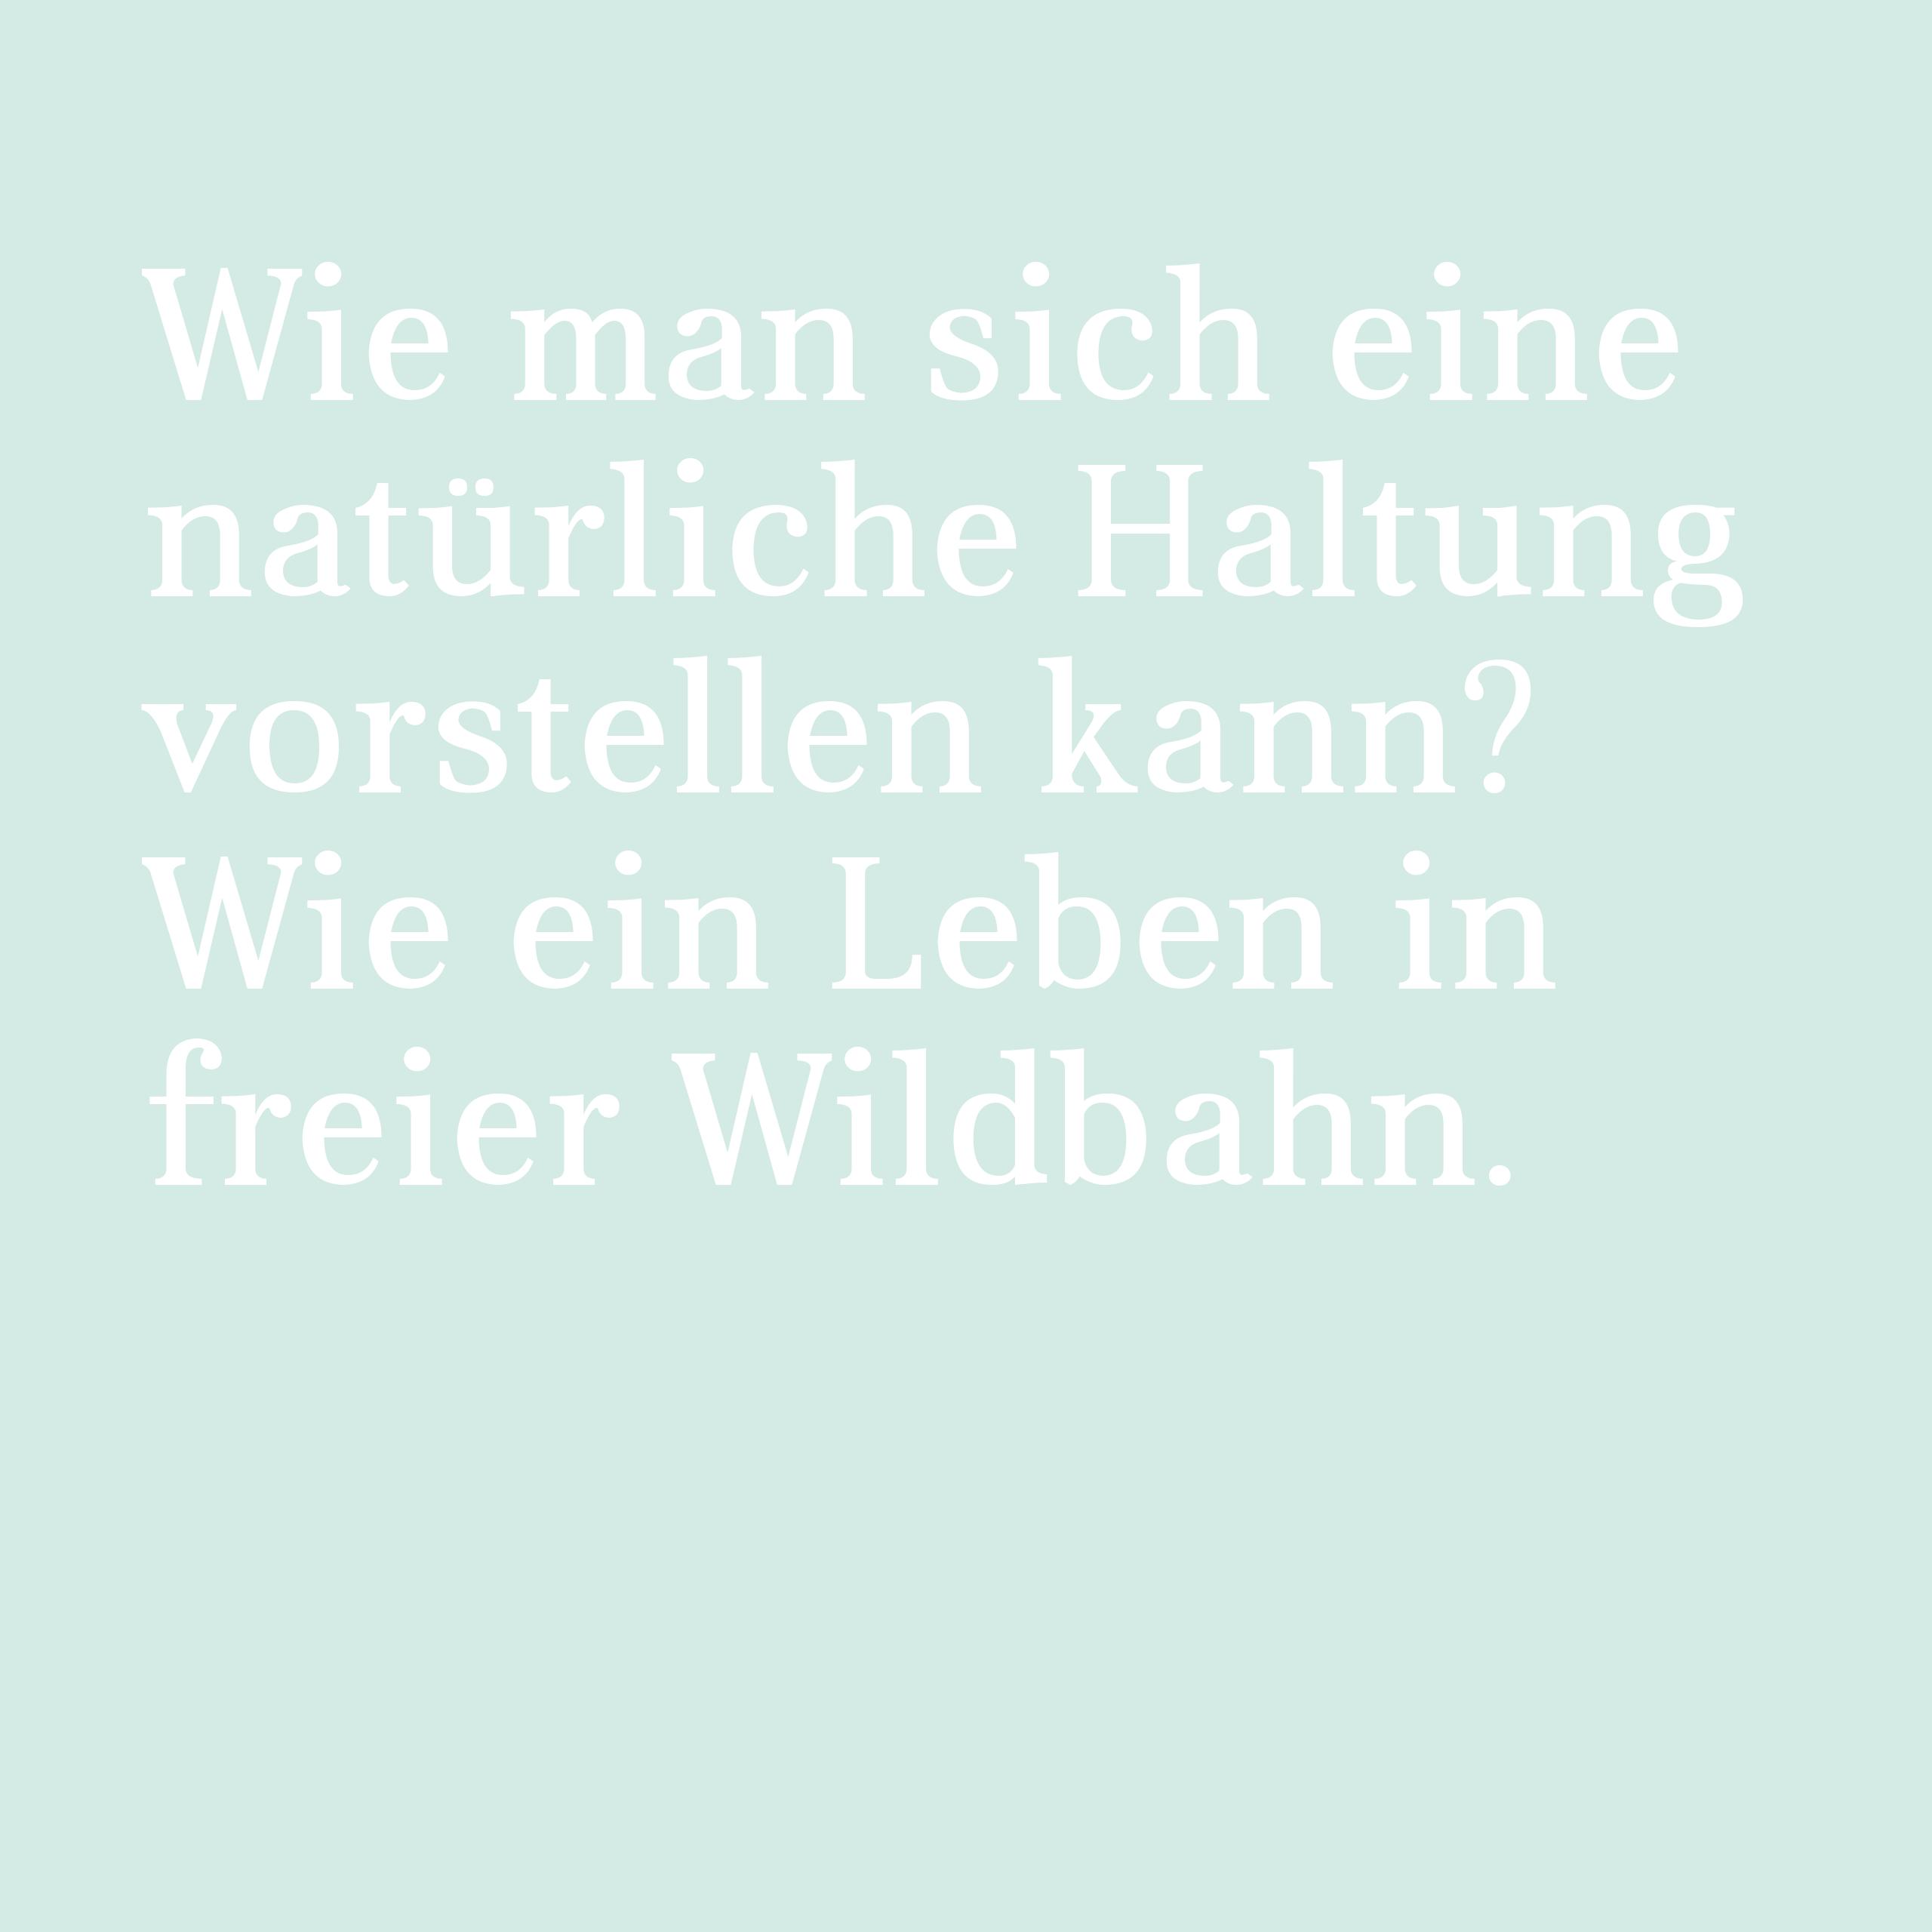 Ref vicha 10 Spruch freie Wildbahn RZ